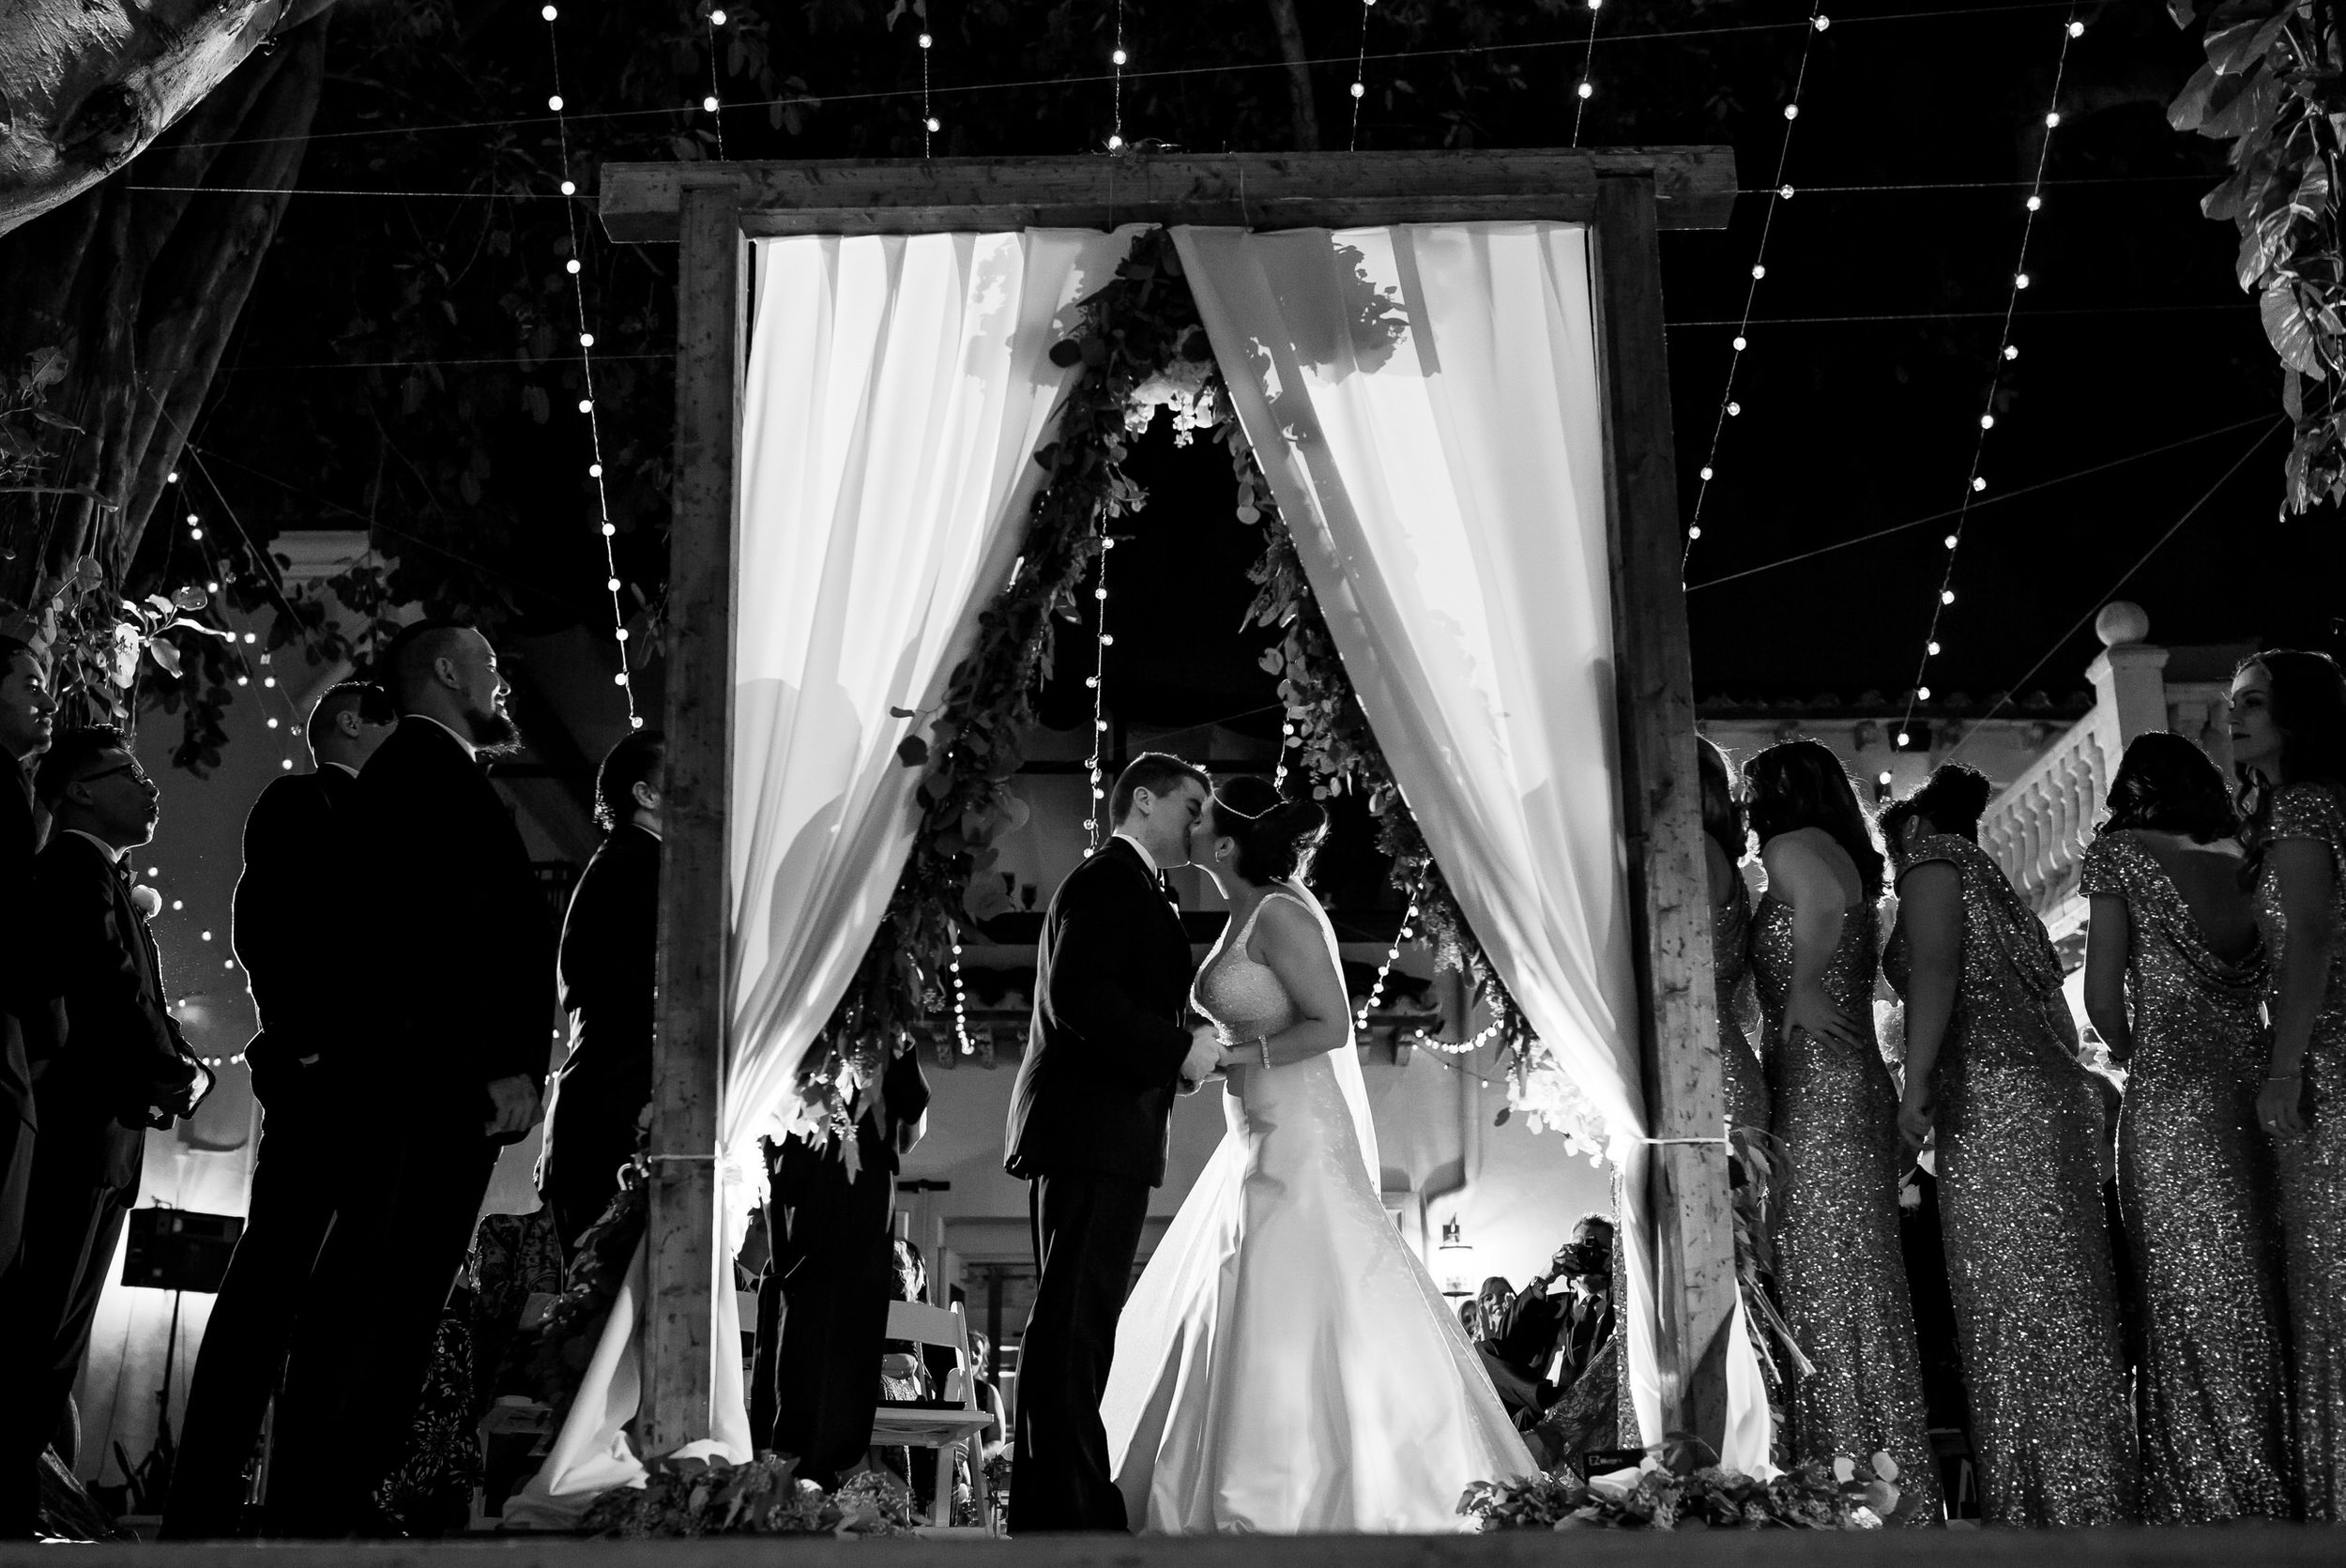 first_kiss_tiny_house_photo_documentary_wedding_photographer_south_florida_worldwide.jpg